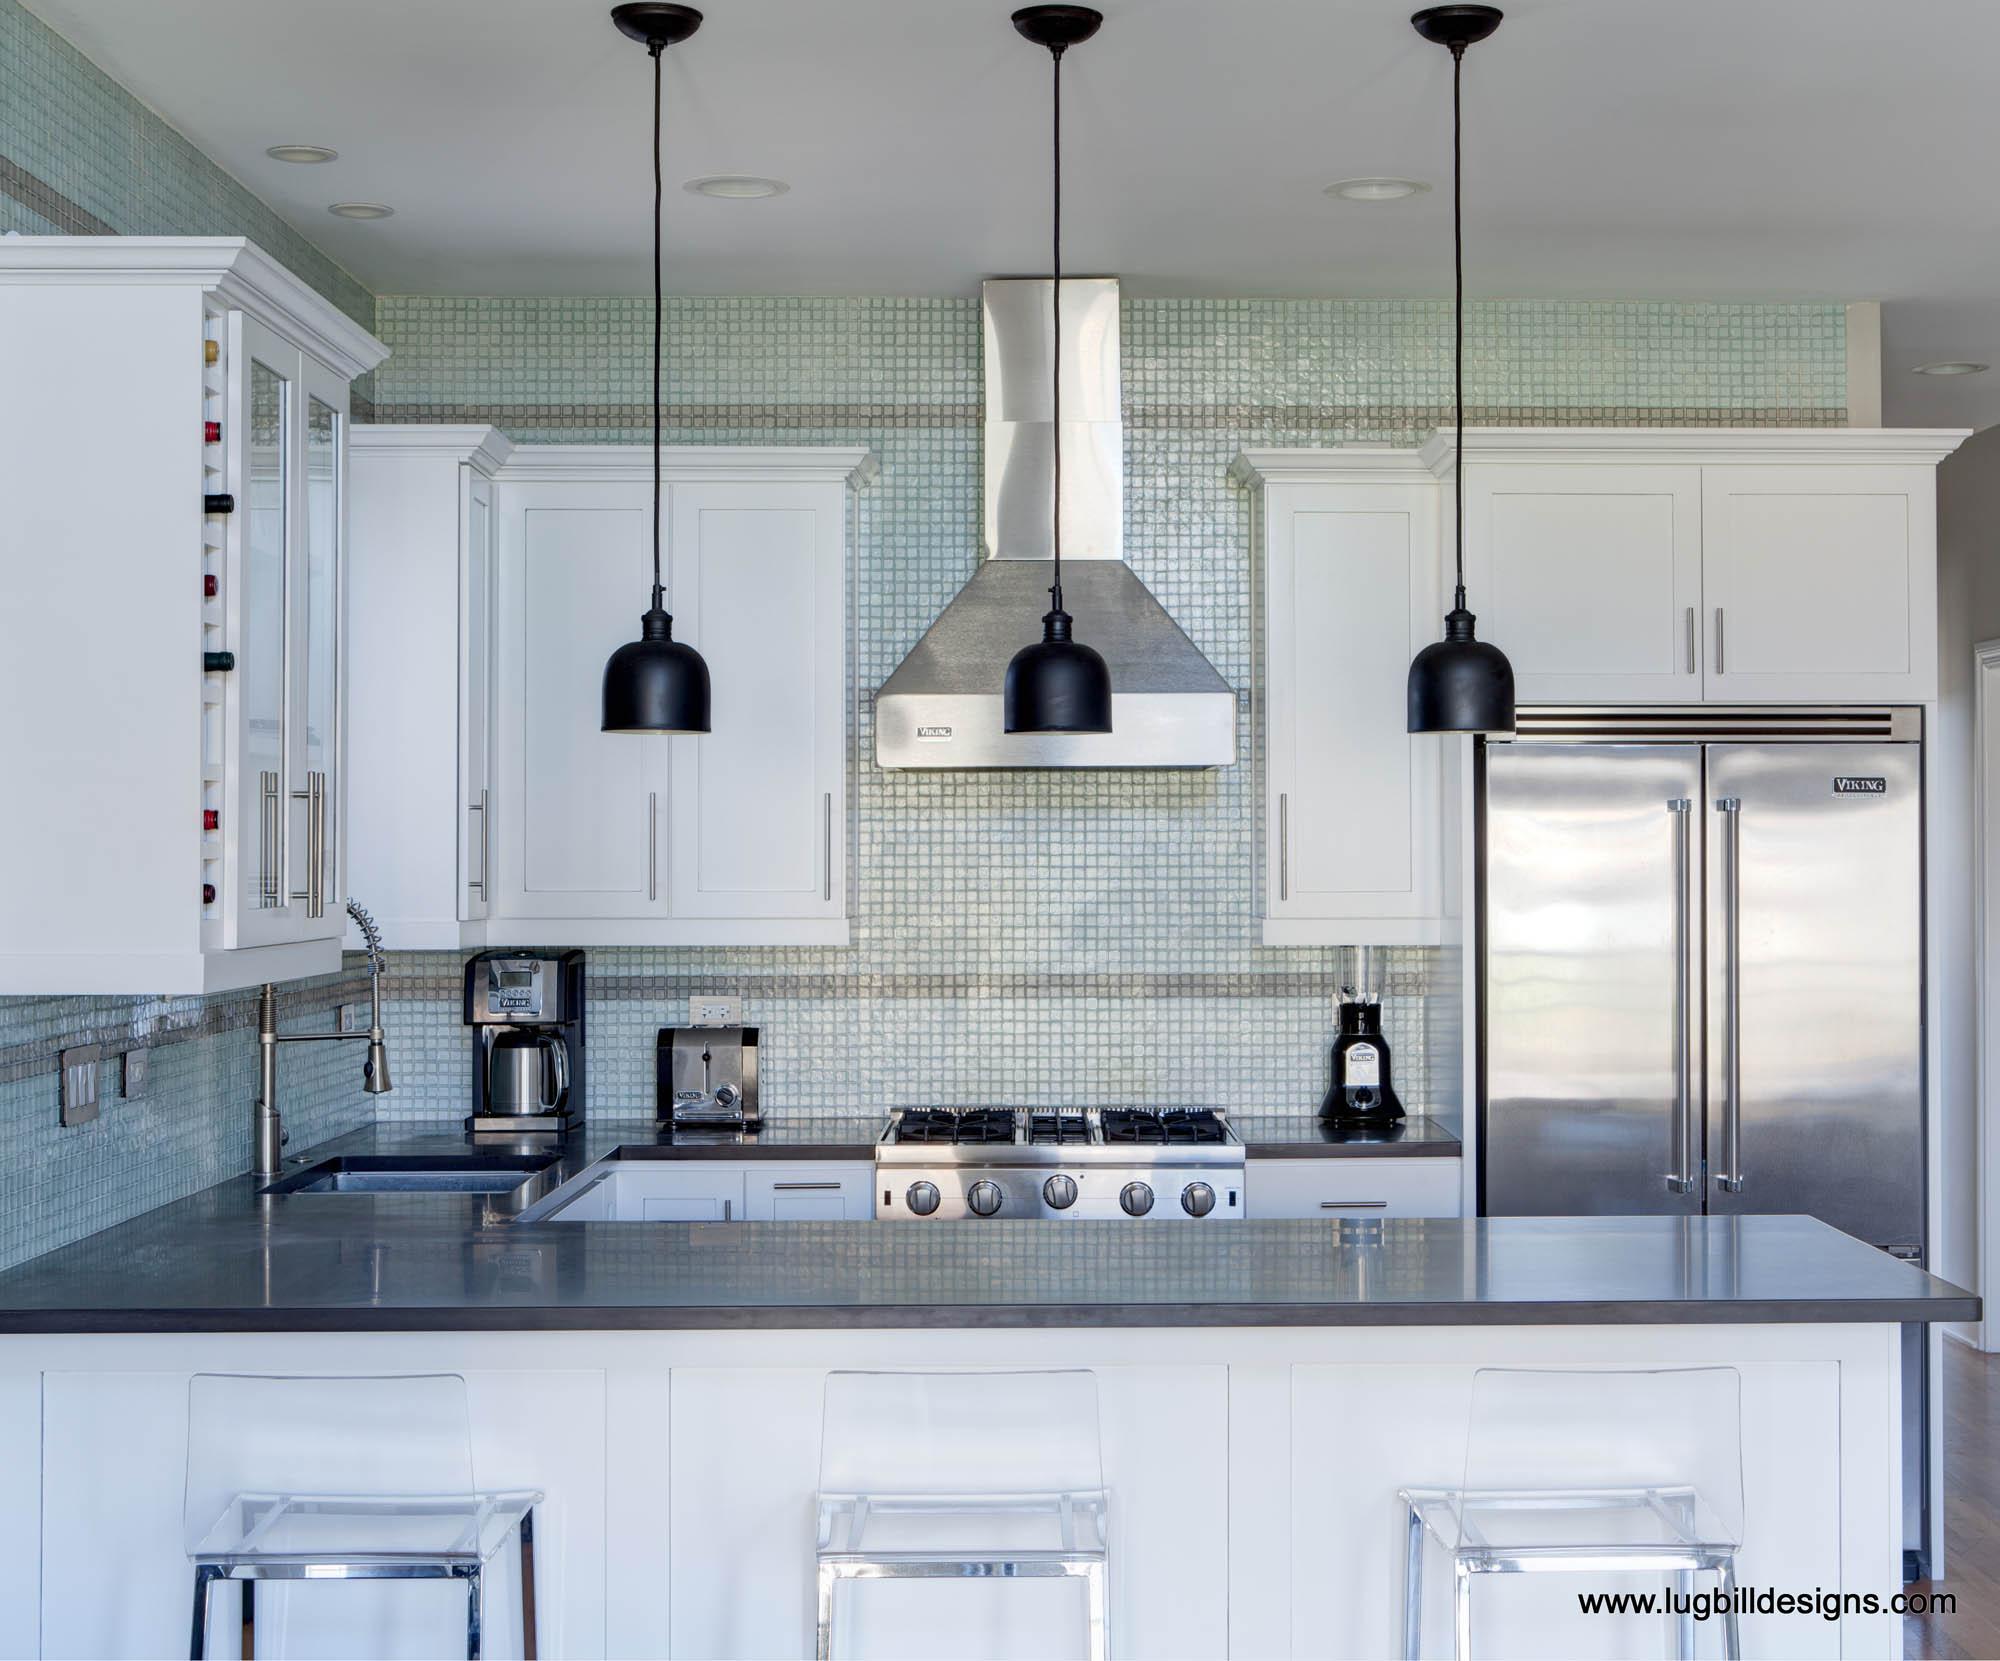 designer kitchens by erica lugbill lugbill designs at coroflot